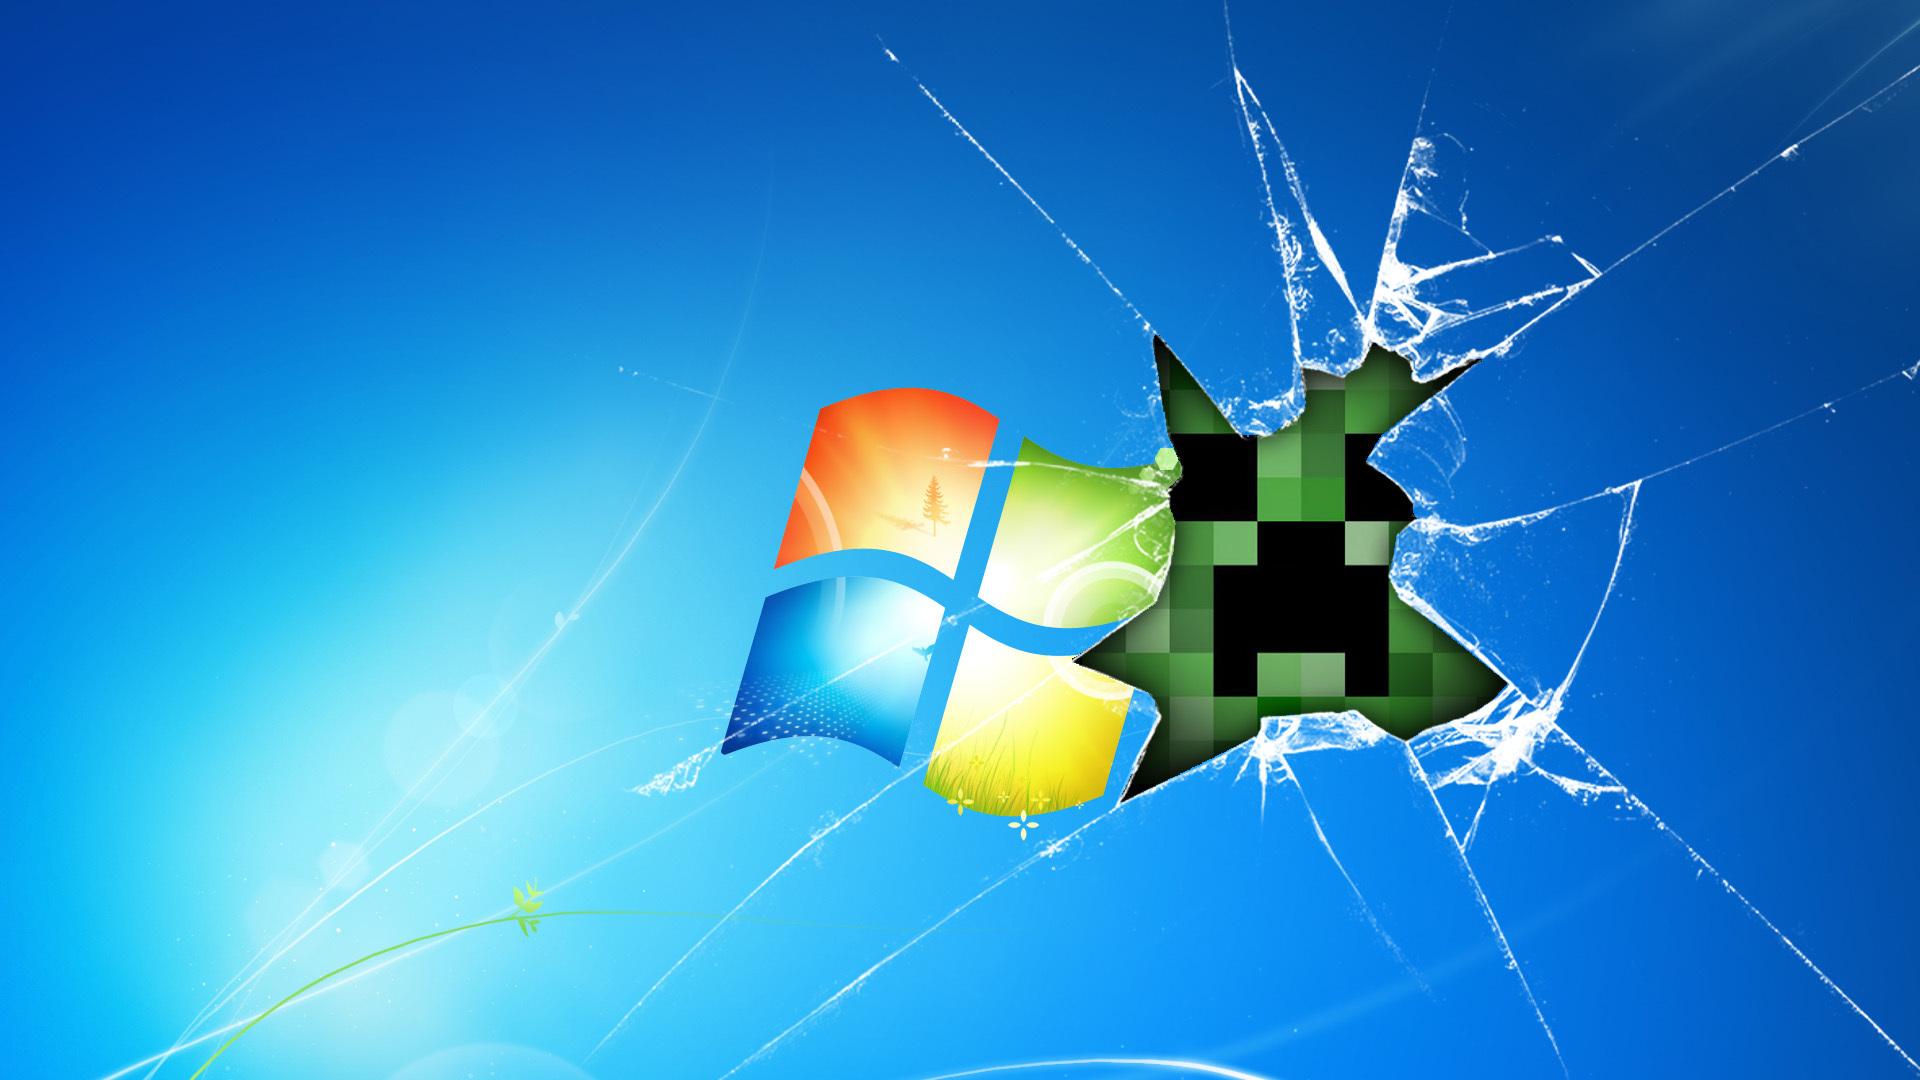 Most Inspiring Wallpaper Minecraft Computer - illustration-sky-Minecraft-blue-glass-Toy-windows-game-line-desktop-computer-wallpaper-atmosphere-of-earth-macro-photography-windsports-kite-sports-588694  Photograph_432468.jpg